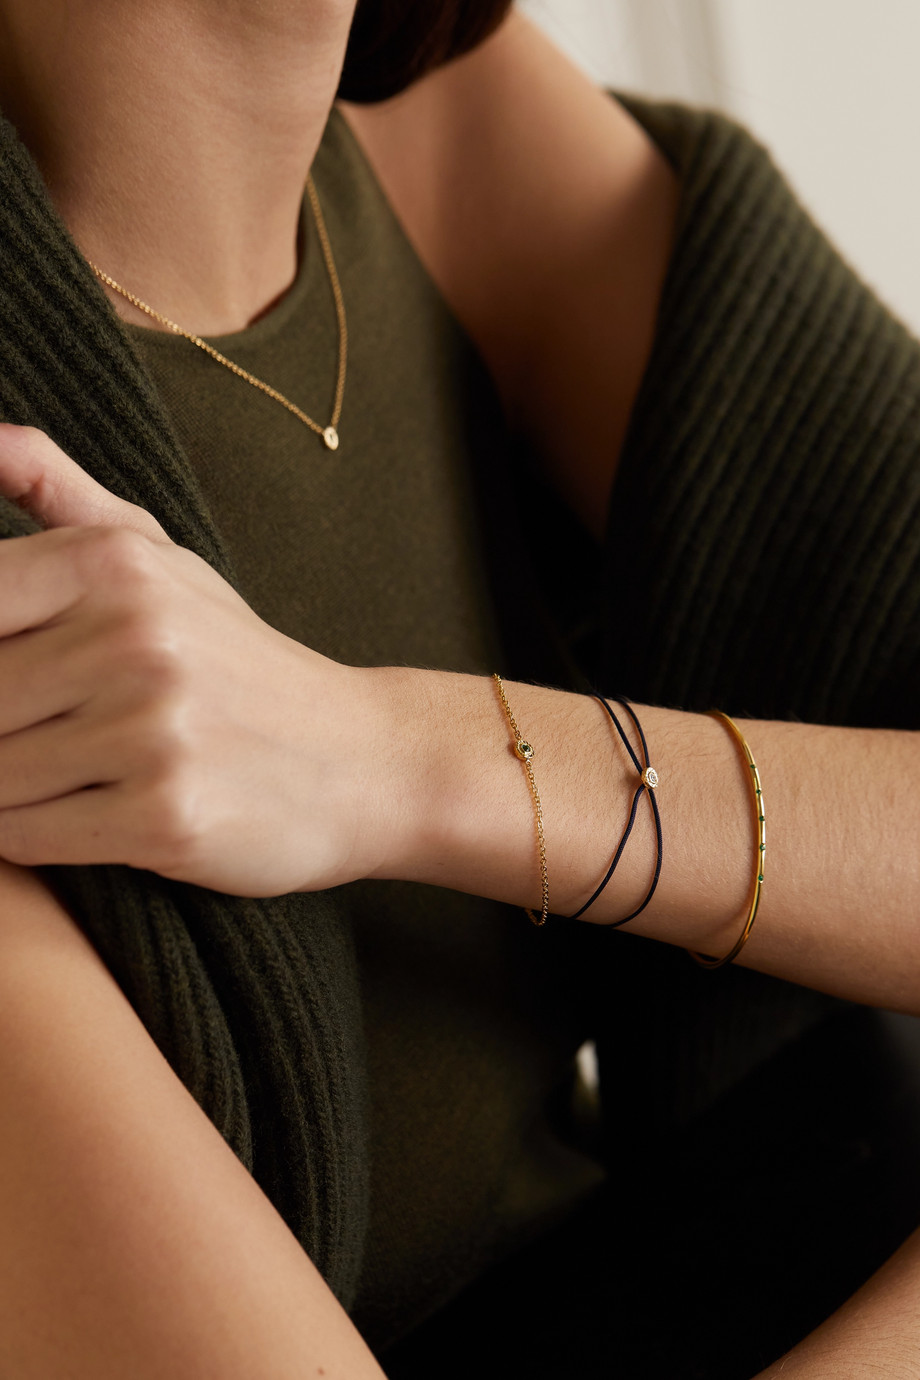 Octavia Elizabeth + NET SUSTAIN Nesting Gem recycled 18-karat gold emerald bracelet